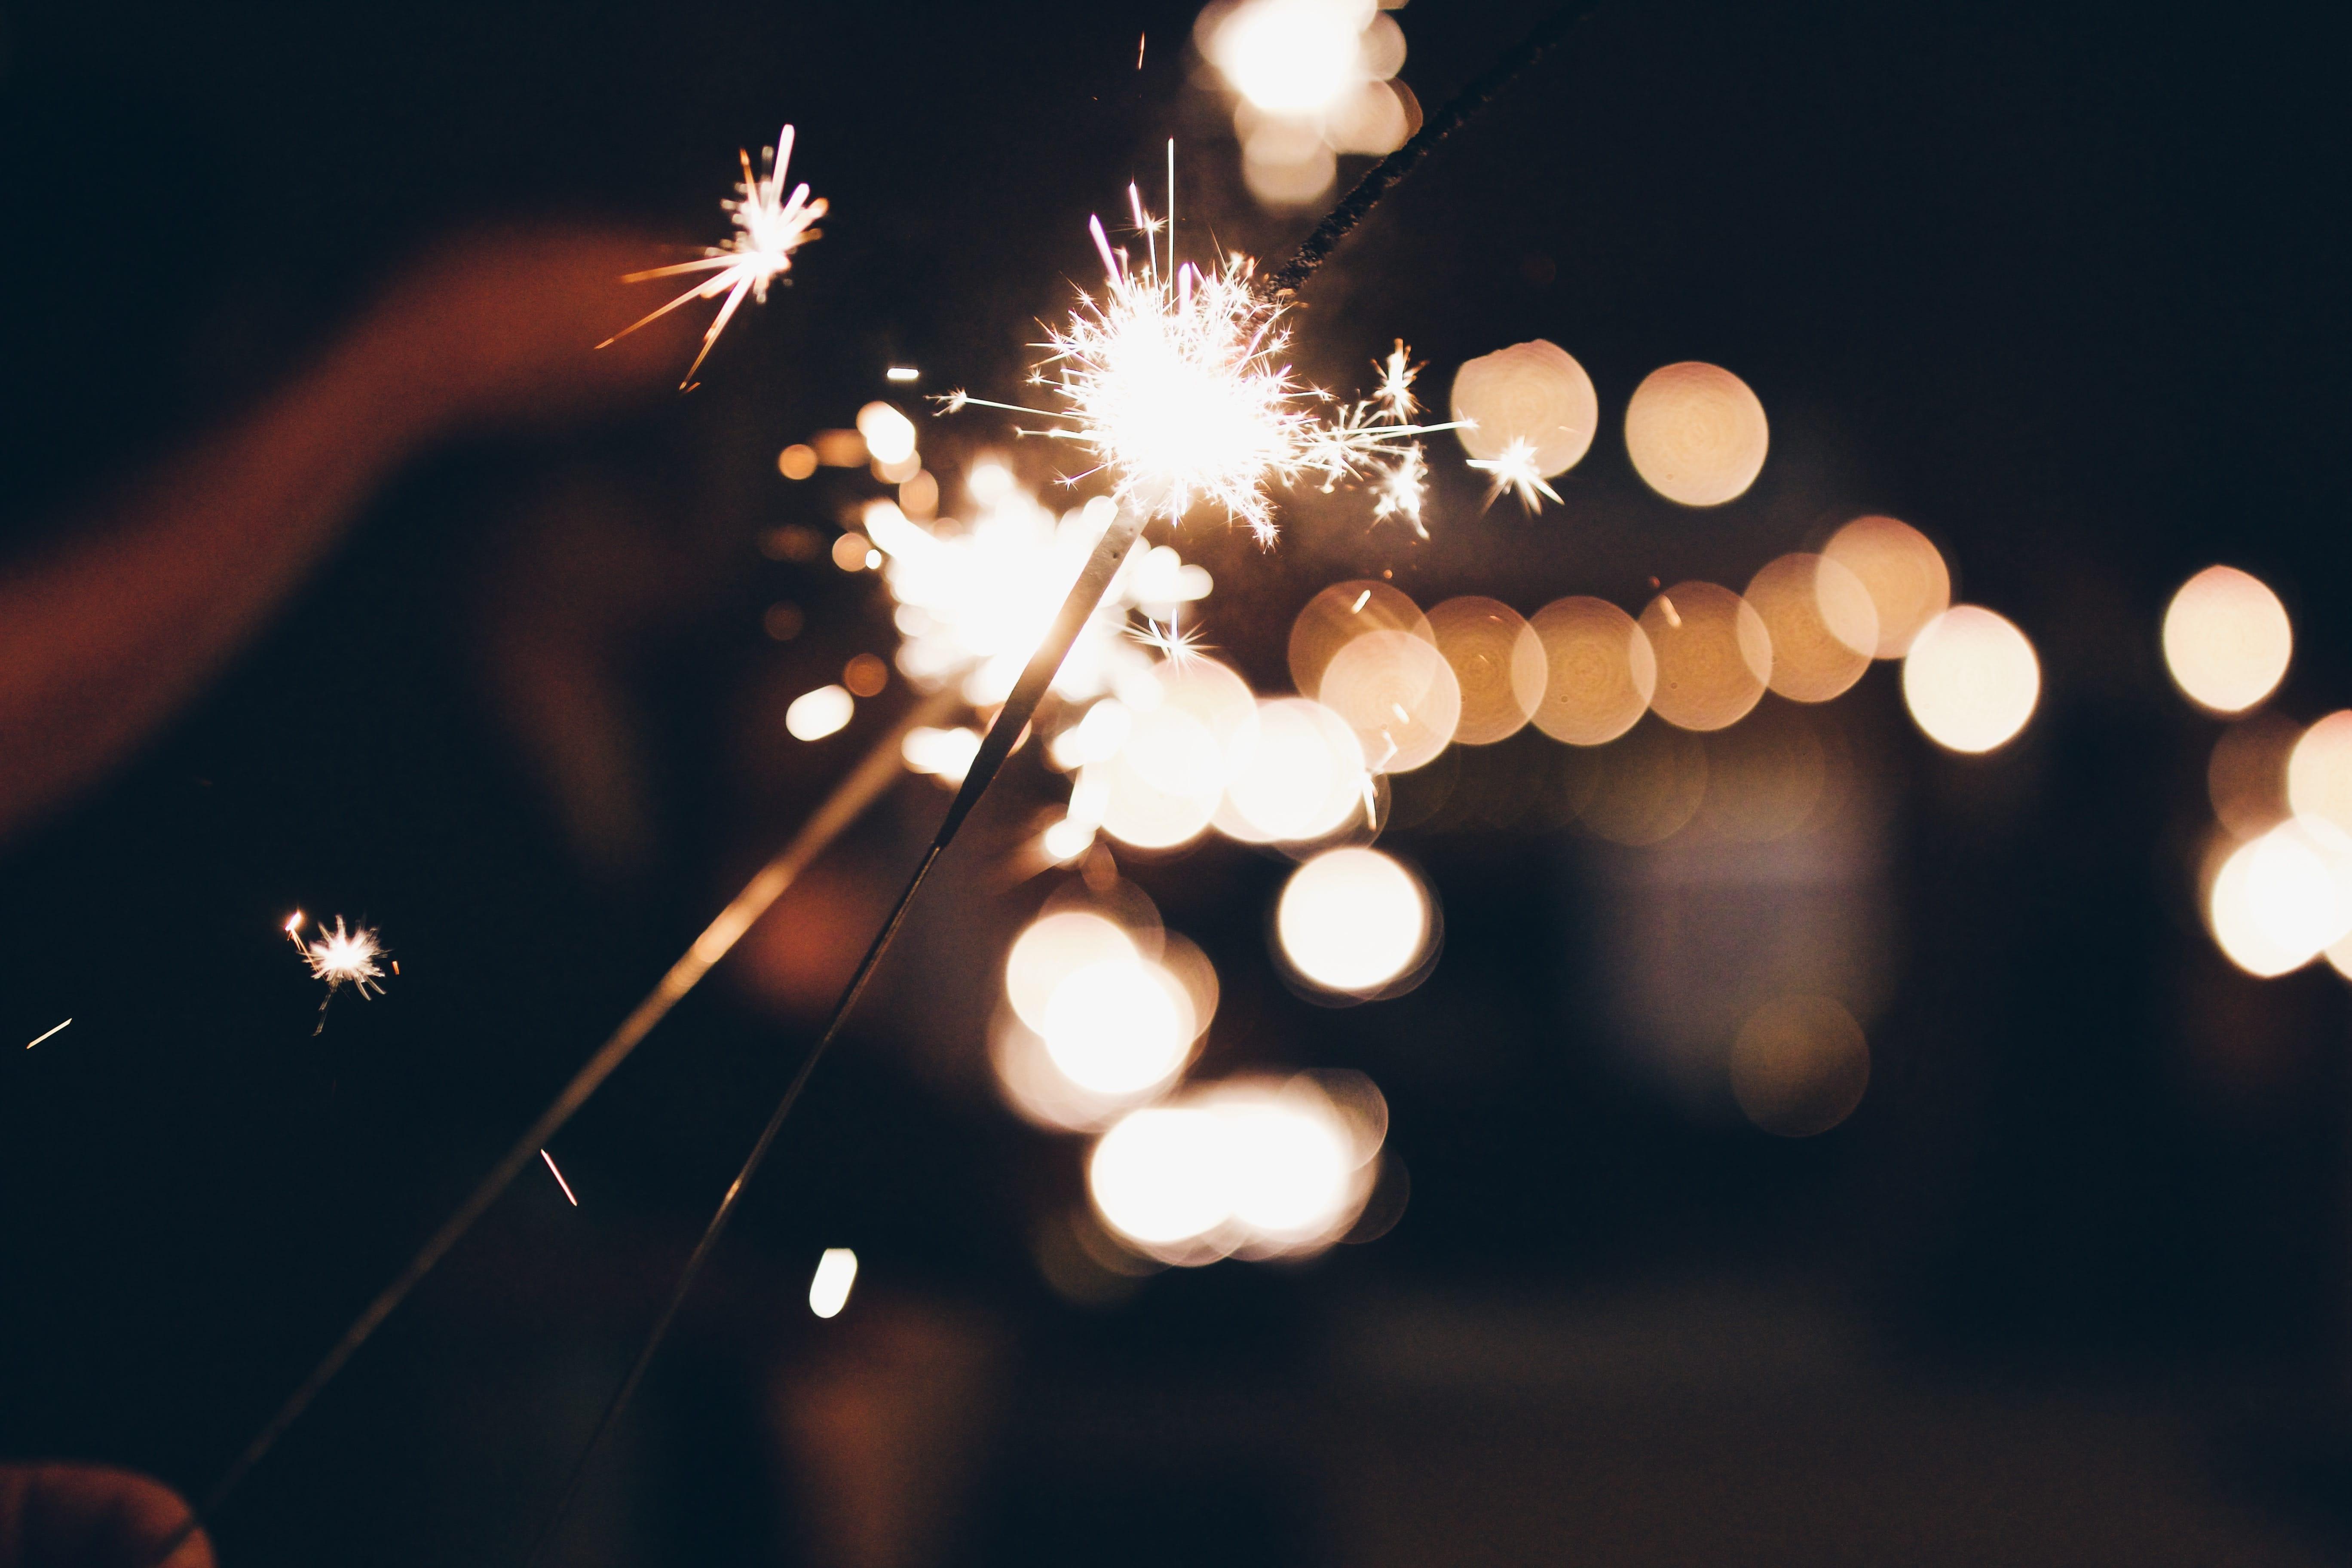 Nieuwjaarswensen 2019 - Kimeru